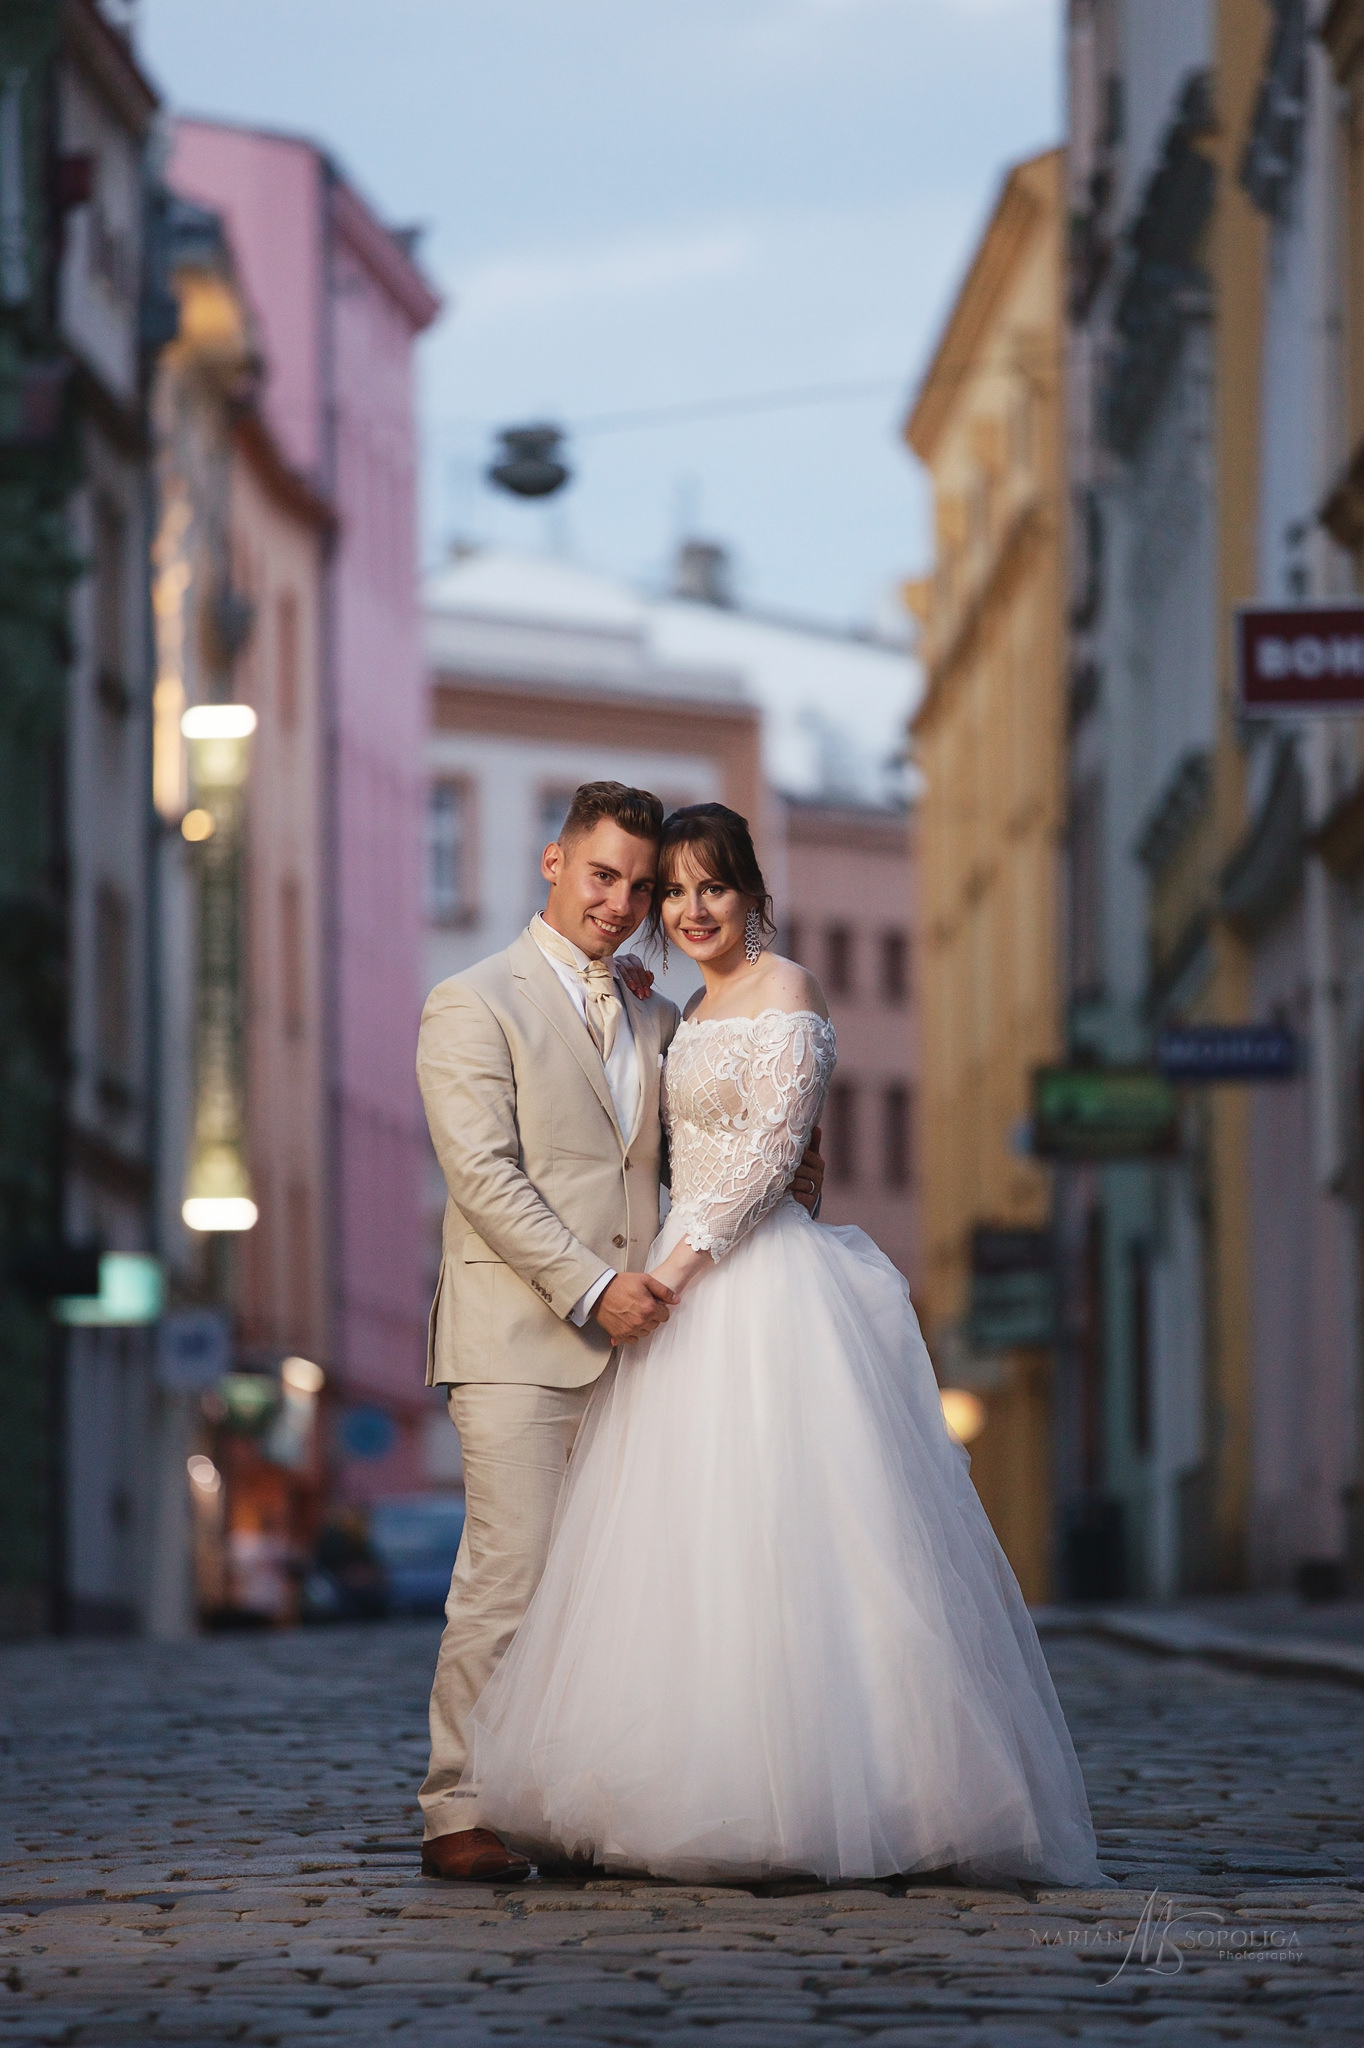 67portretni-svatebni-foto-zenicha-a-nevesty-u-caesarovy-kasny-v-